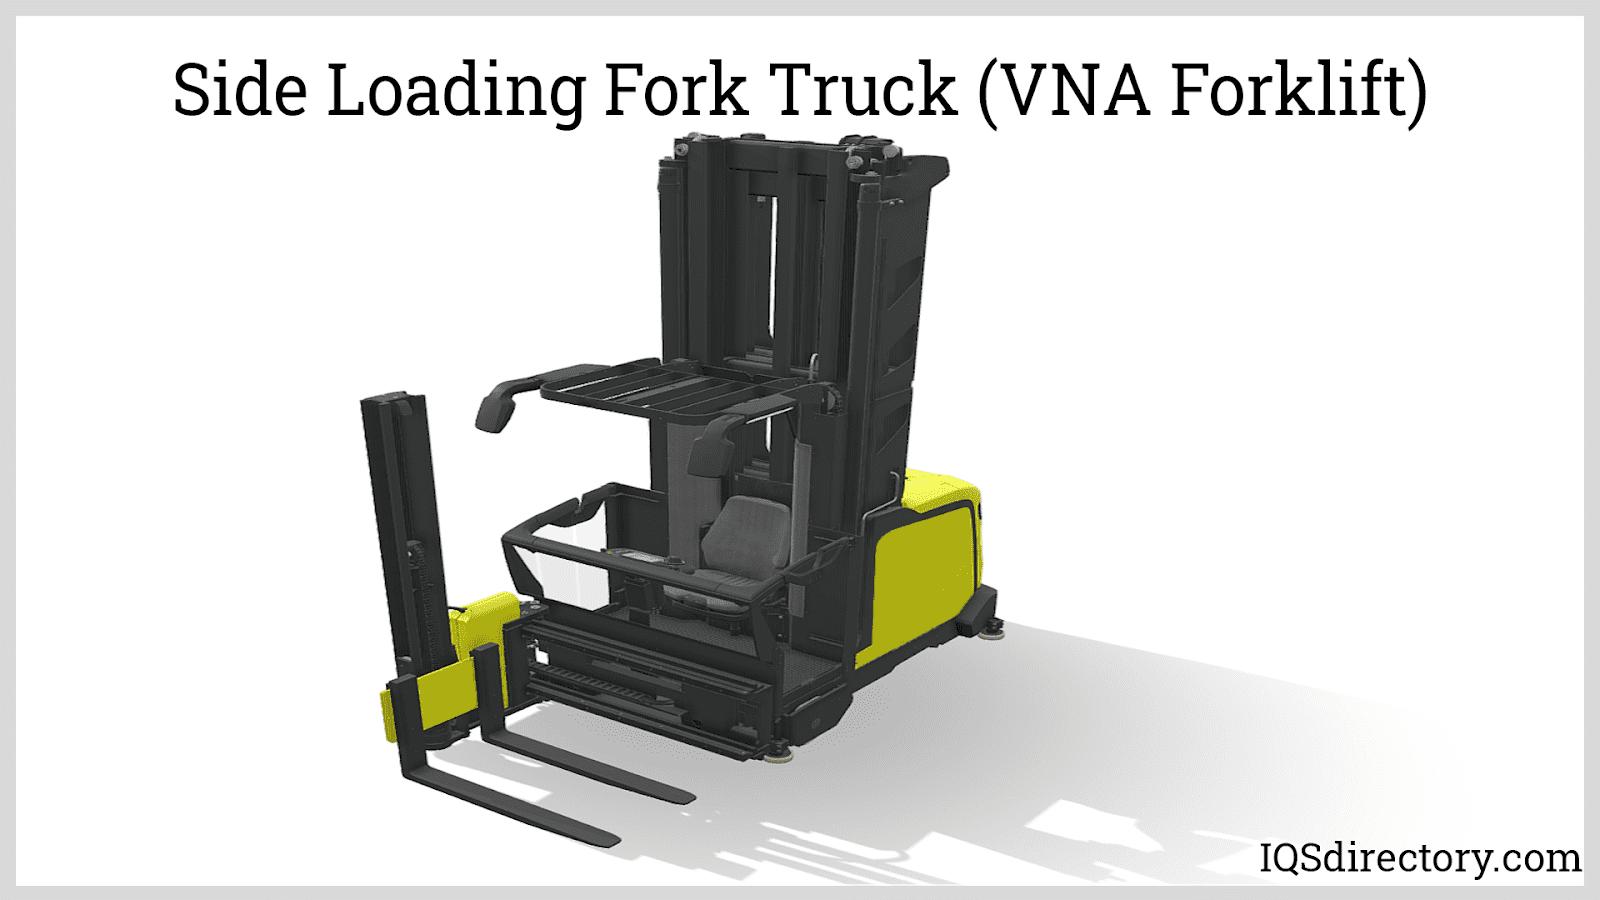 Side Loading Fork Truck (VNA Forklift)